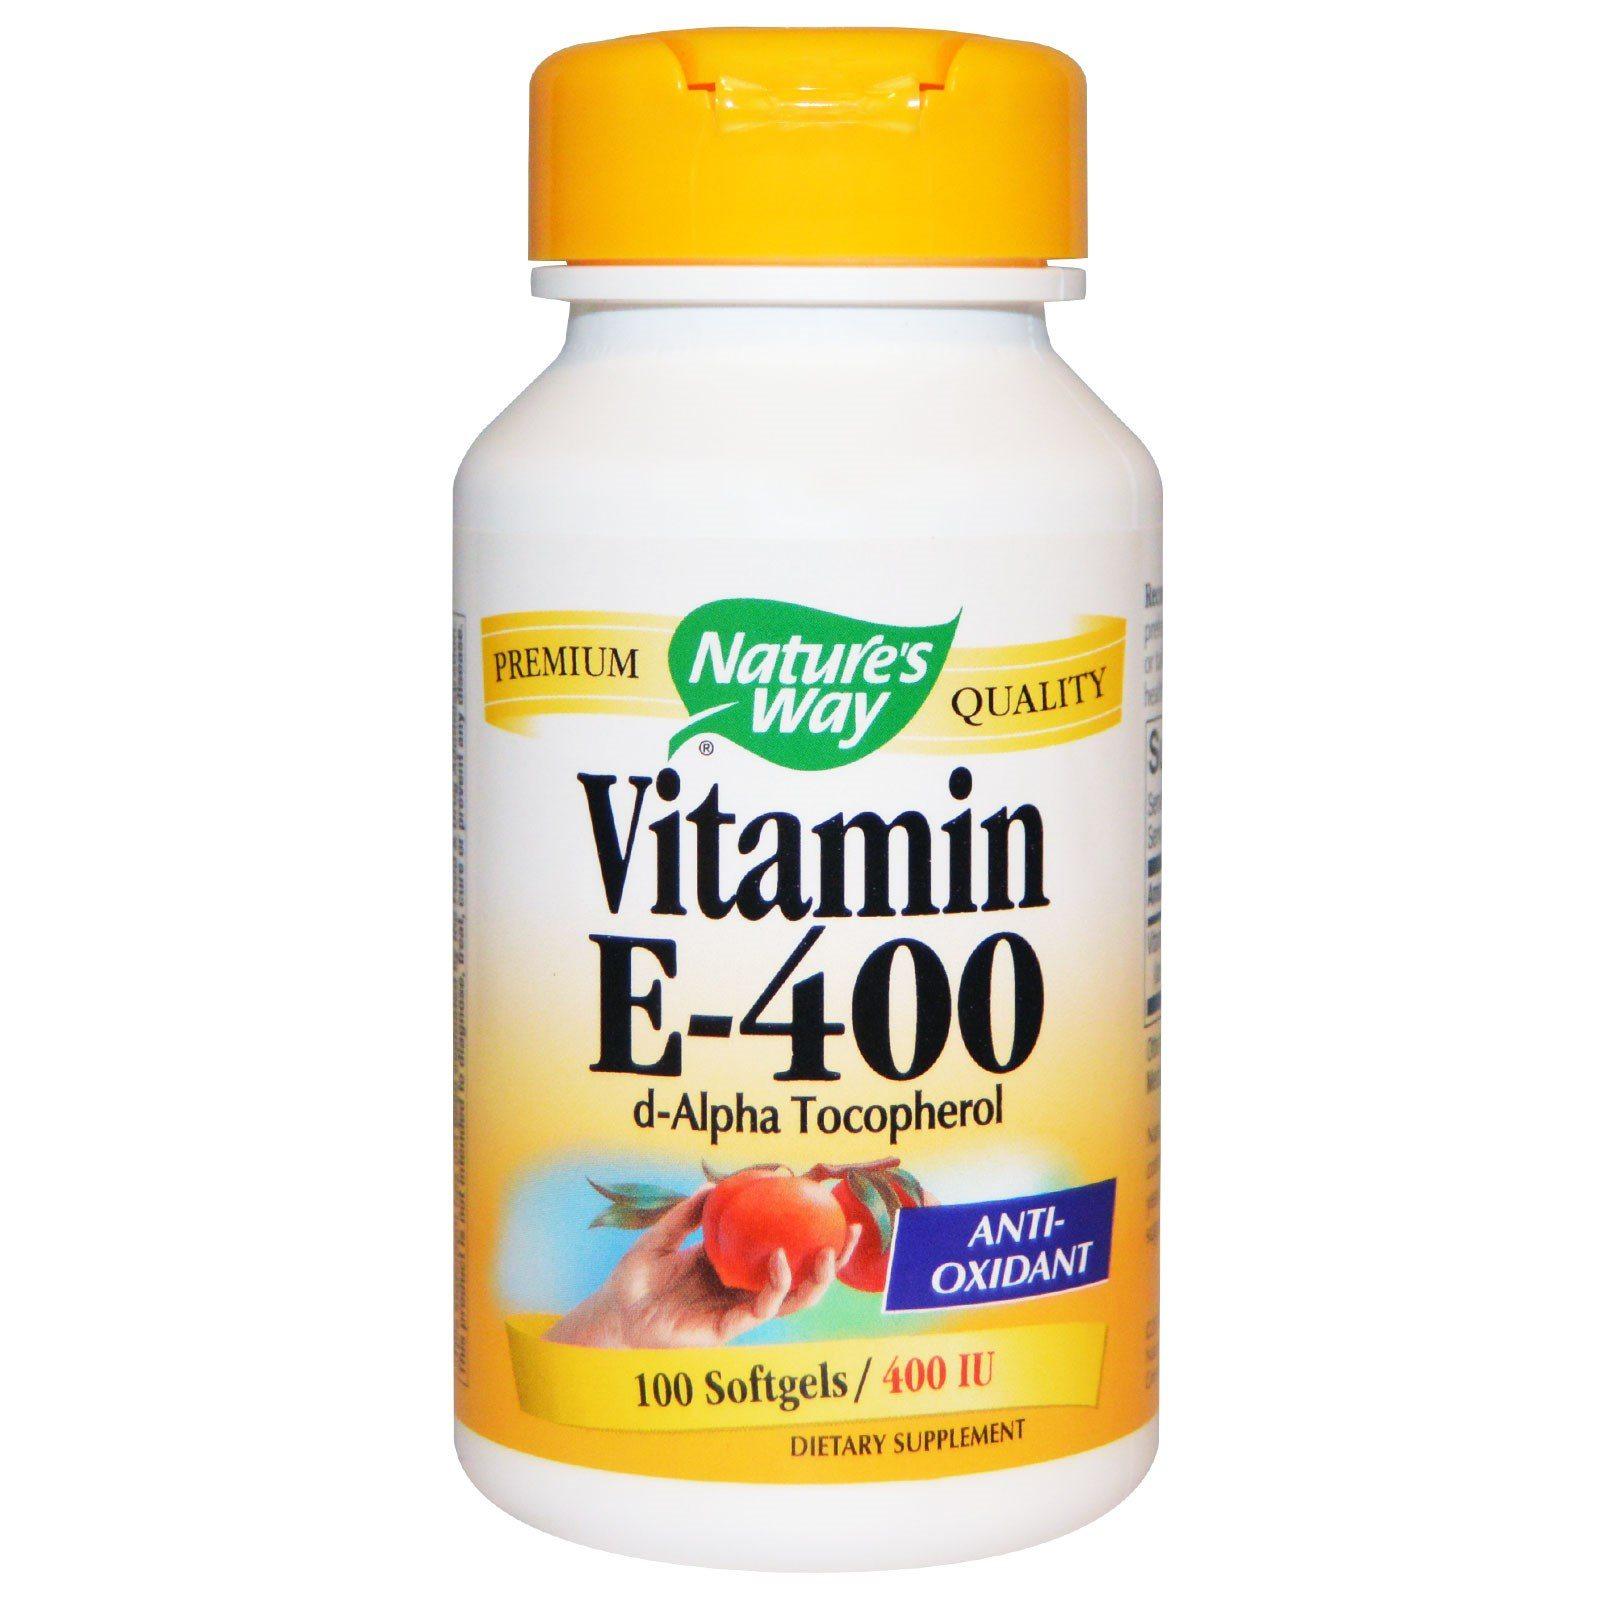 Vitamin E, repairing damaged cells